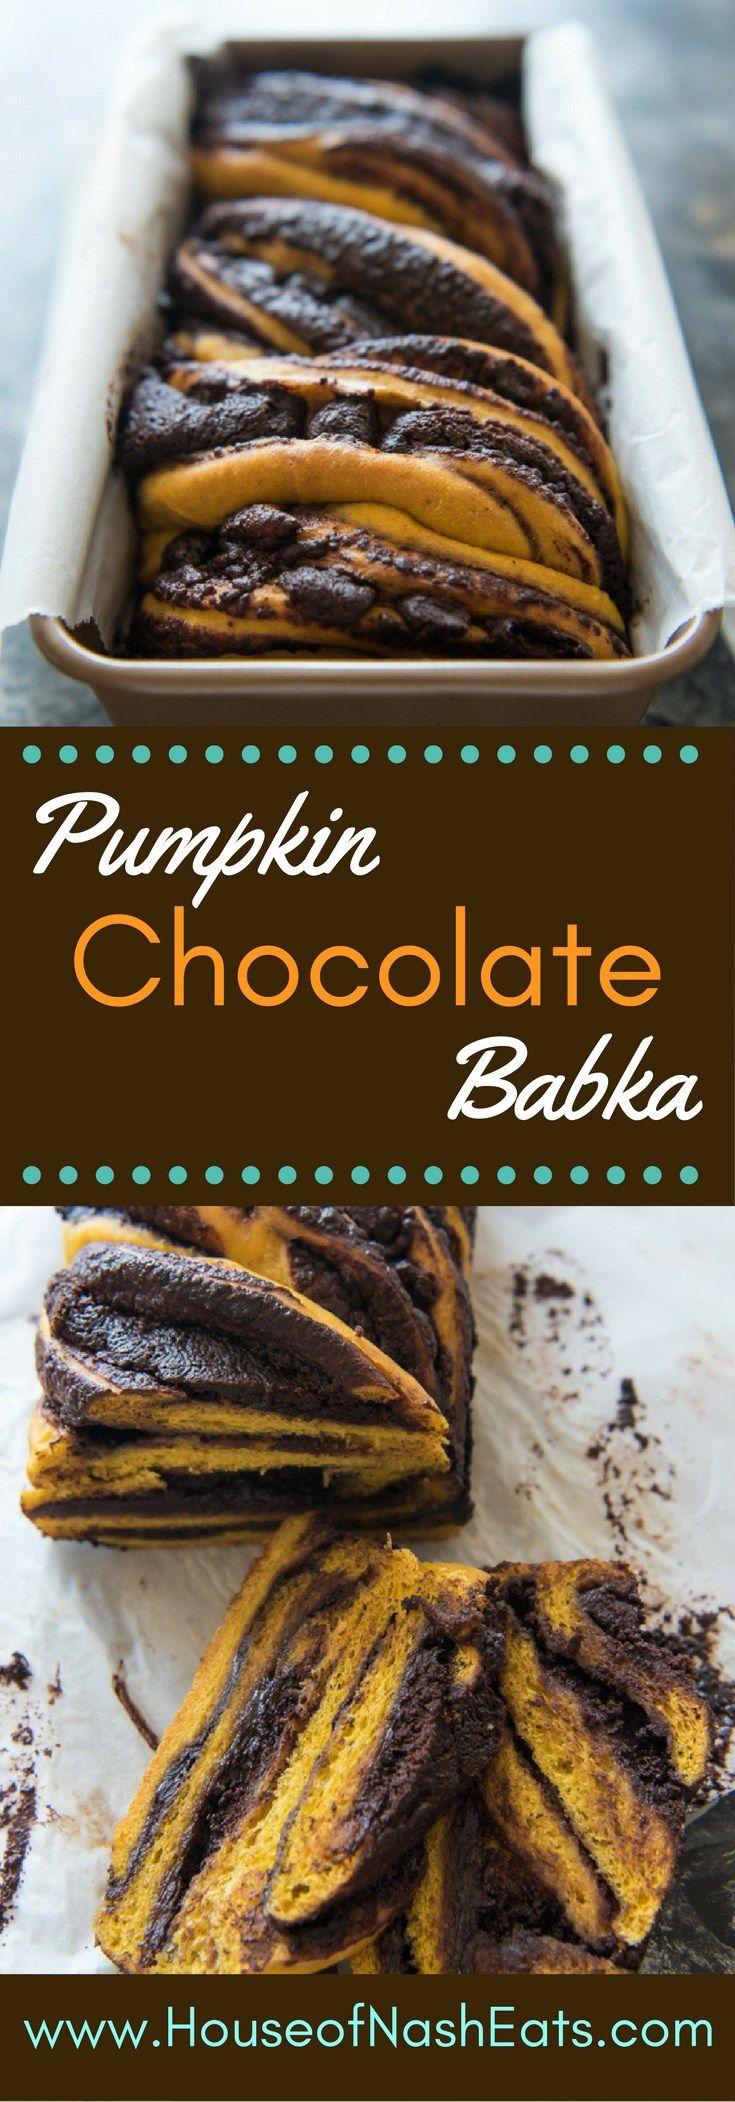 Sweet, spiced pumpkin yeast bread meets rich, dark chocolate in this twist on…